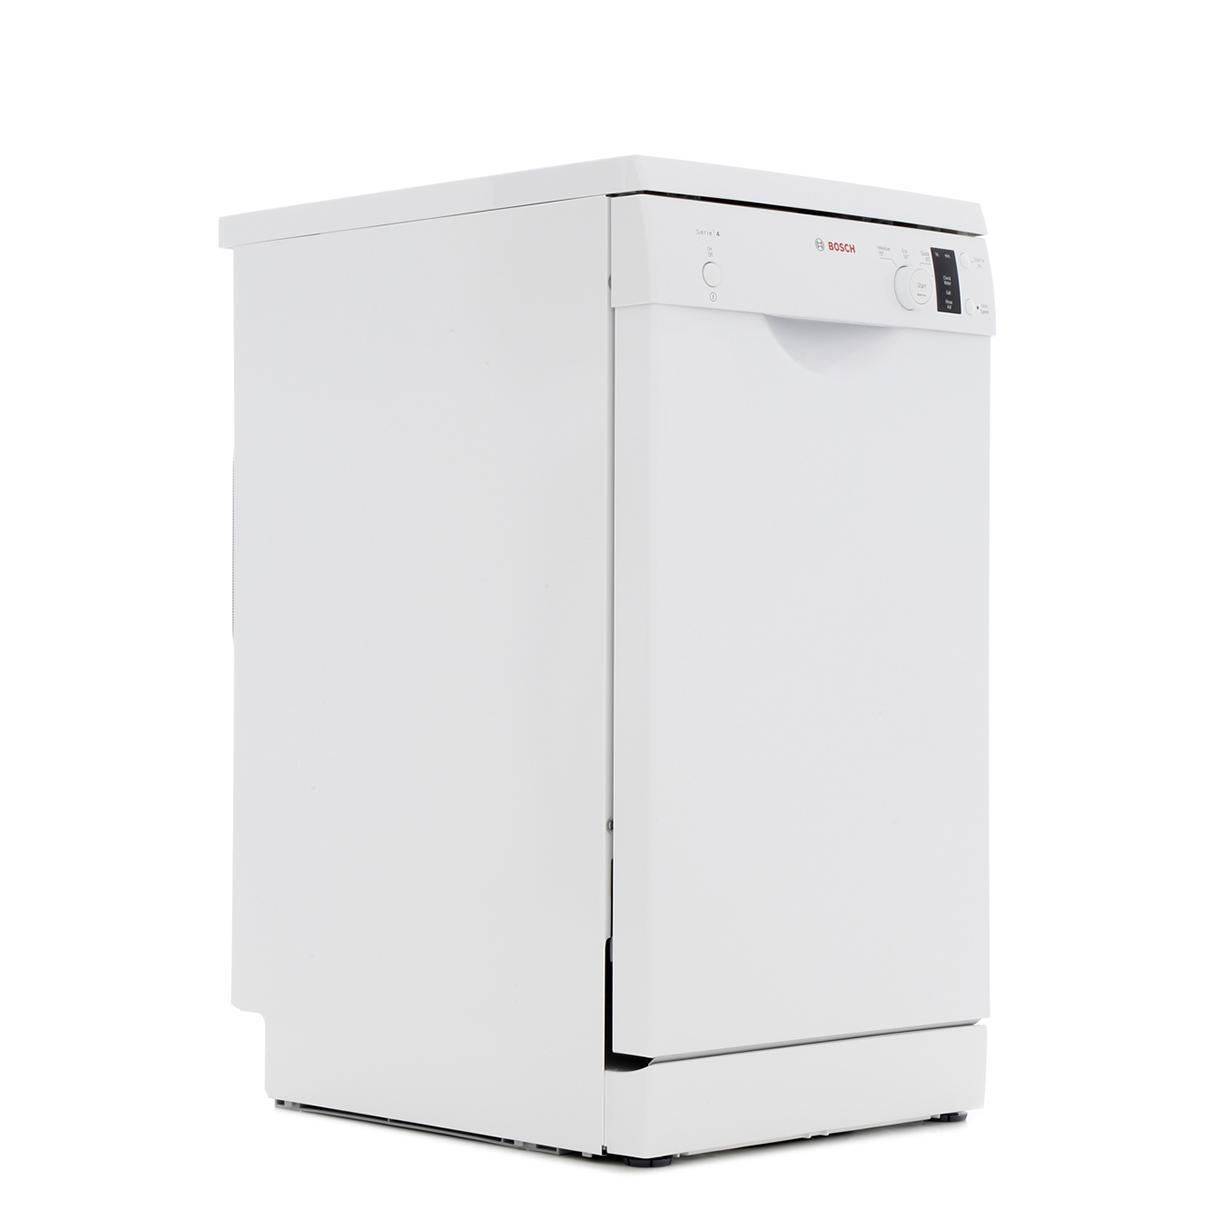 Bosch Serie 4 SPS40E12GB Slimline Dishwasher